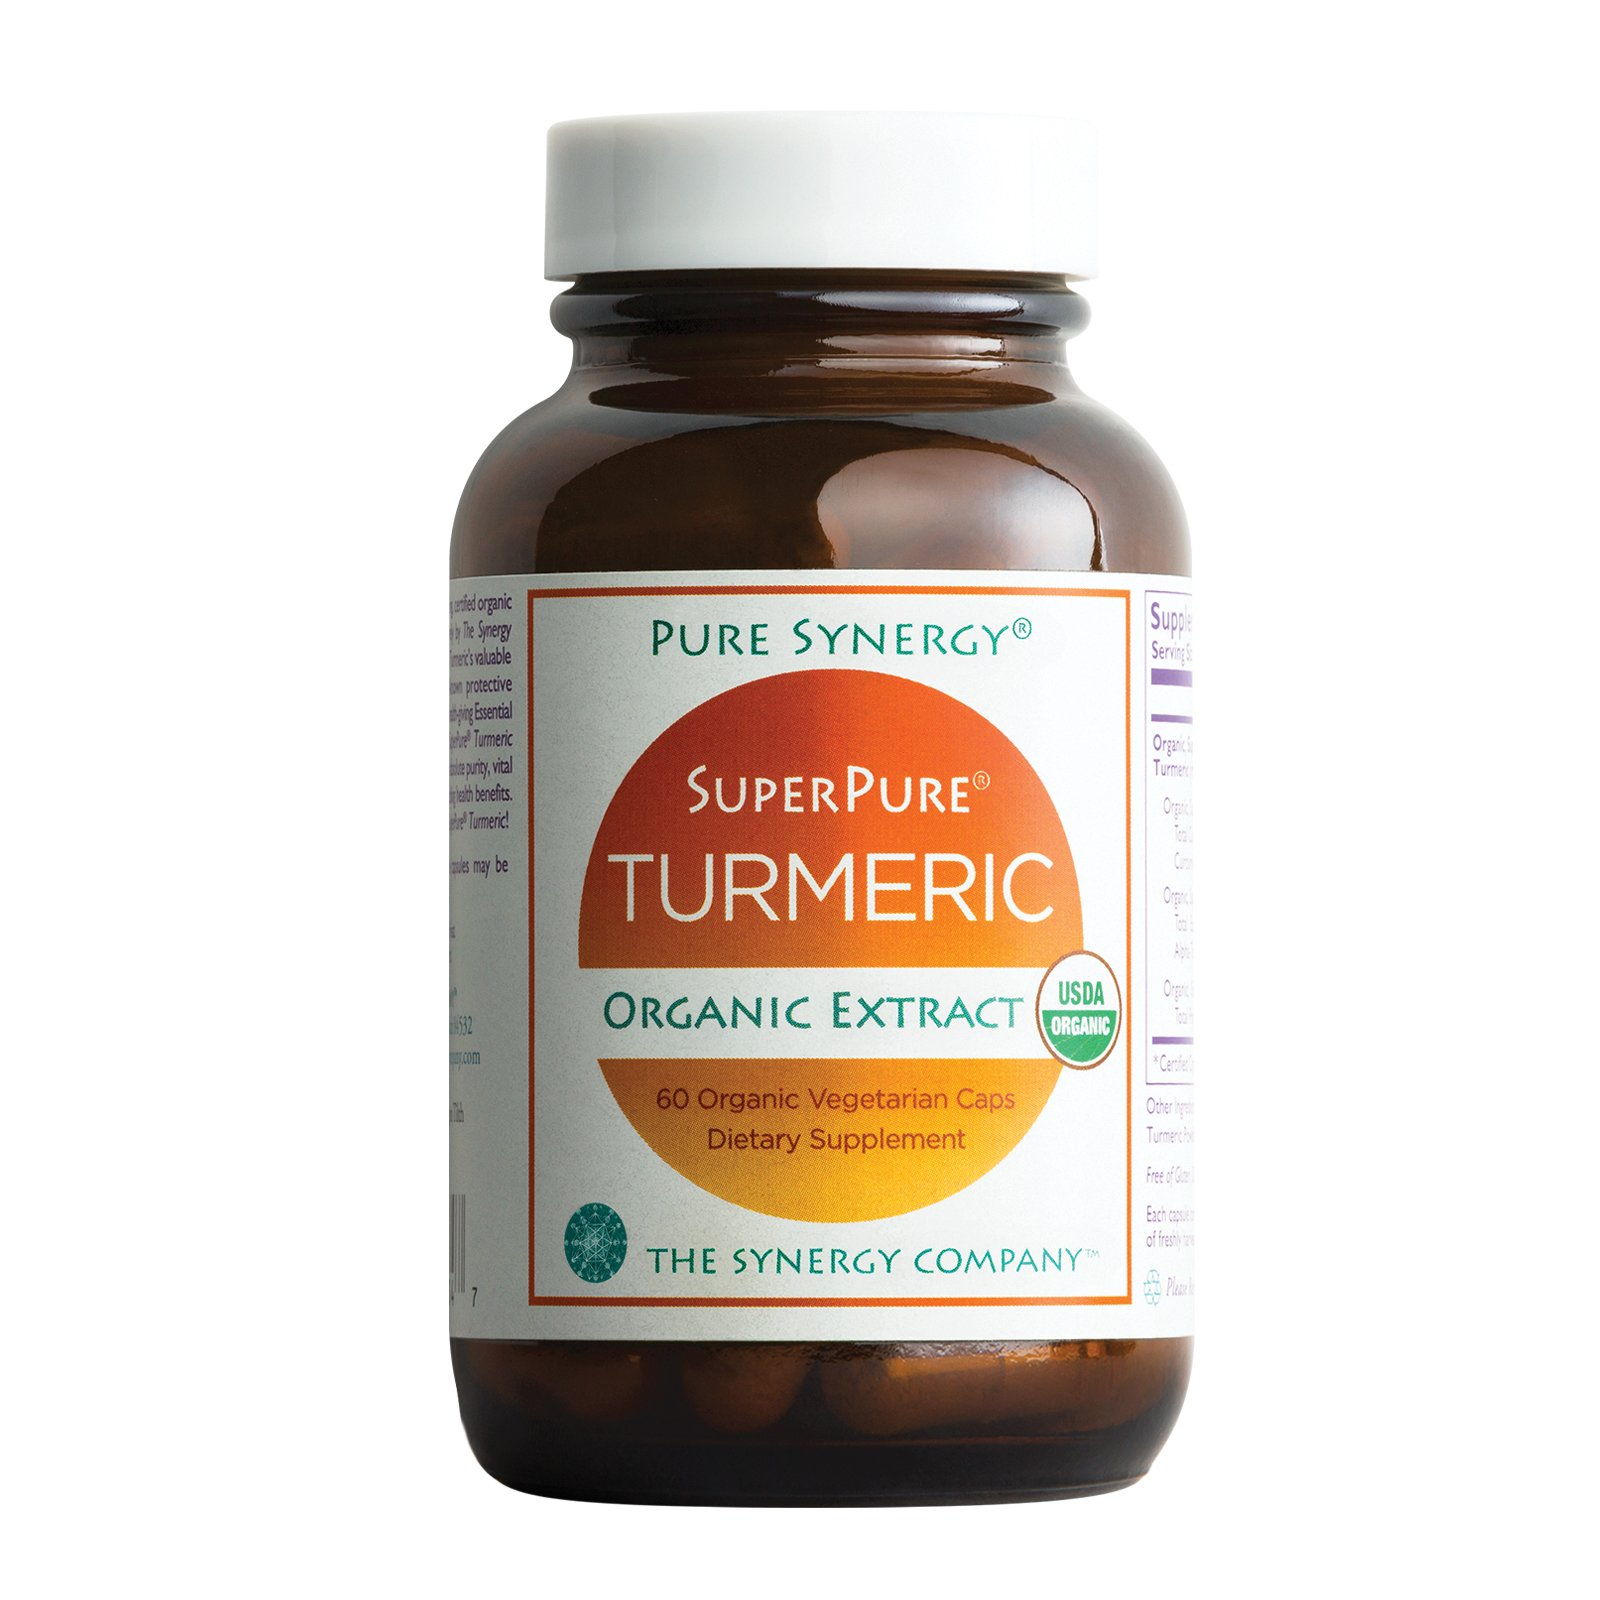 Pure Synergy USDA Organic SuperPure Turmeric Extract (60 Capsules) Triple Extract w/ Curcumin, Turmerones